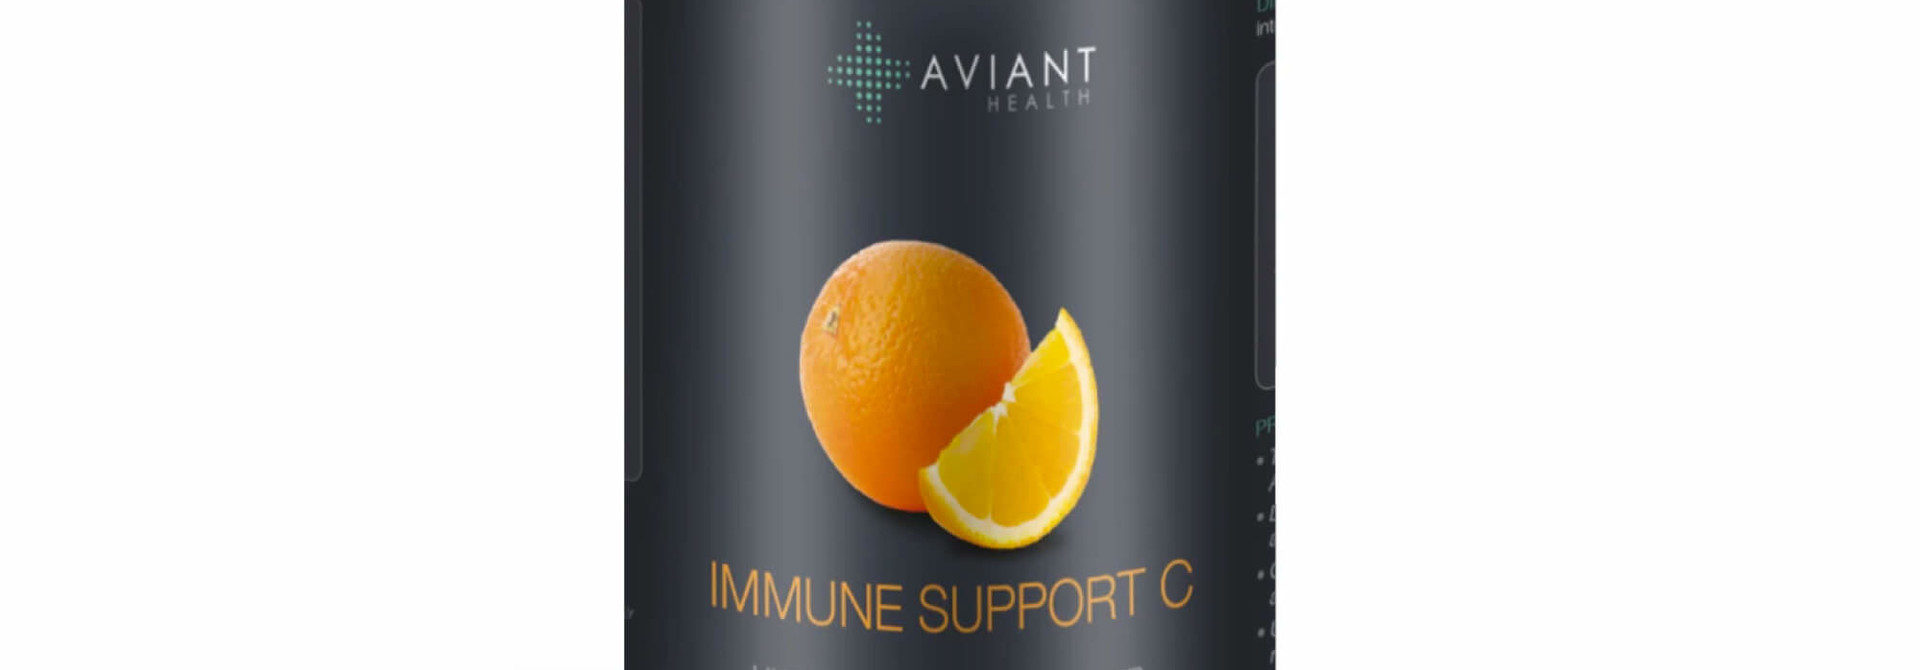 Aviant Immune Support C - High Dose Vitamin C Powder 250g